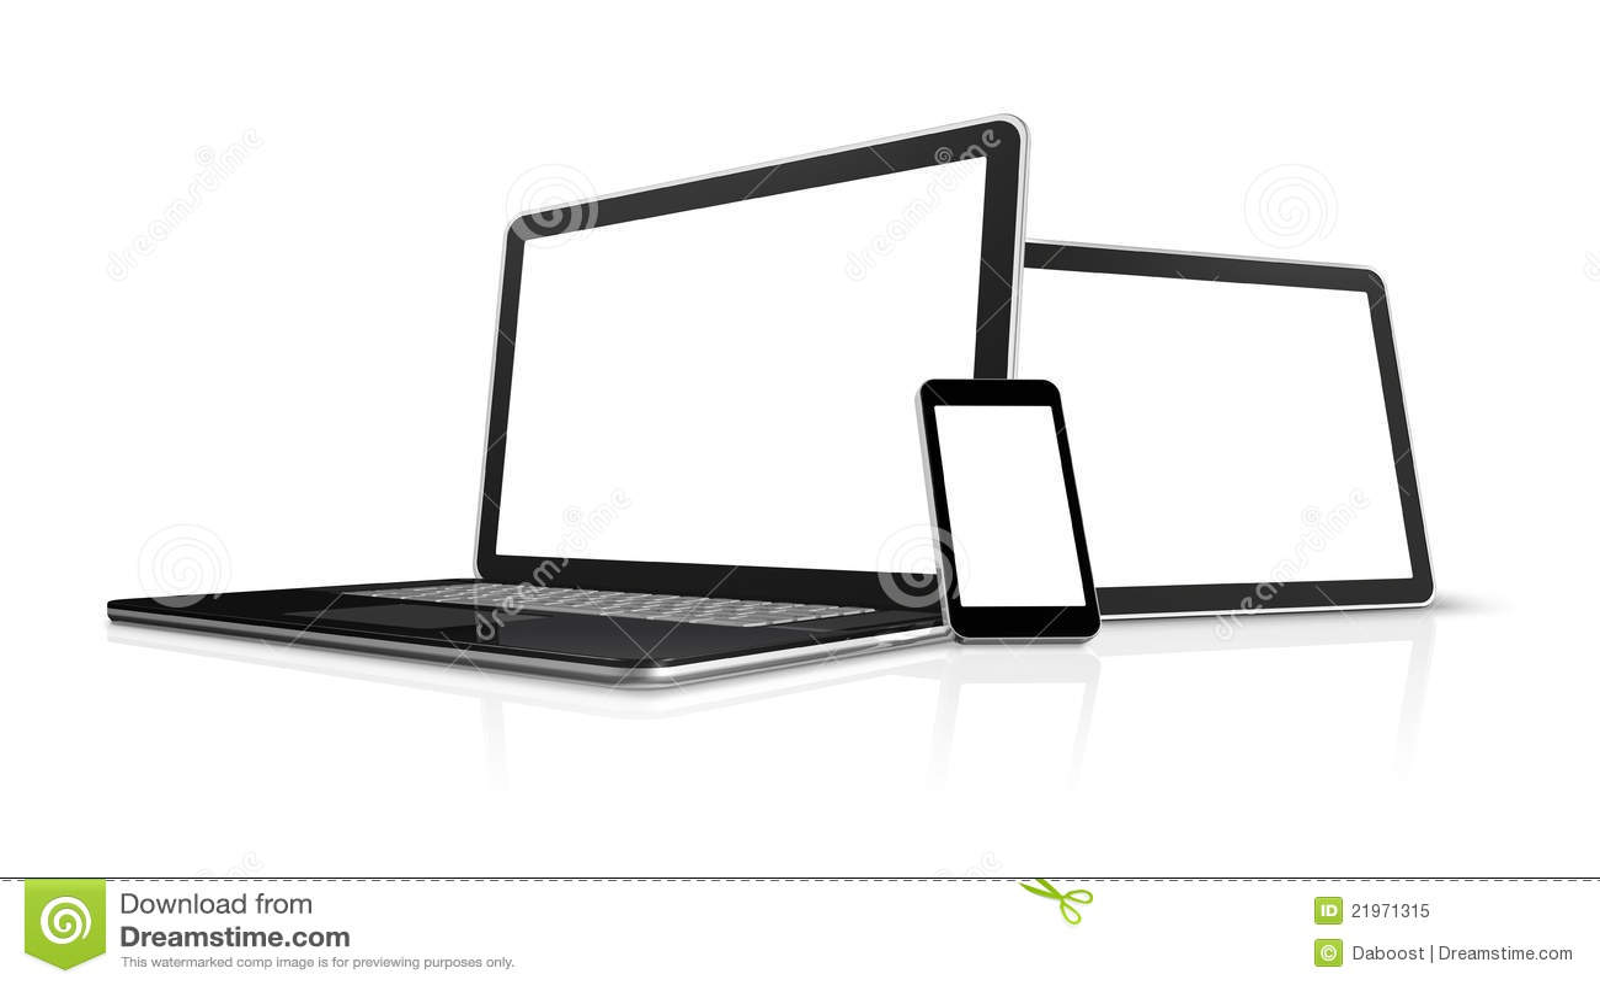 Laptop Mobile Phone Digital Tablet Pc Royalty Free Stock